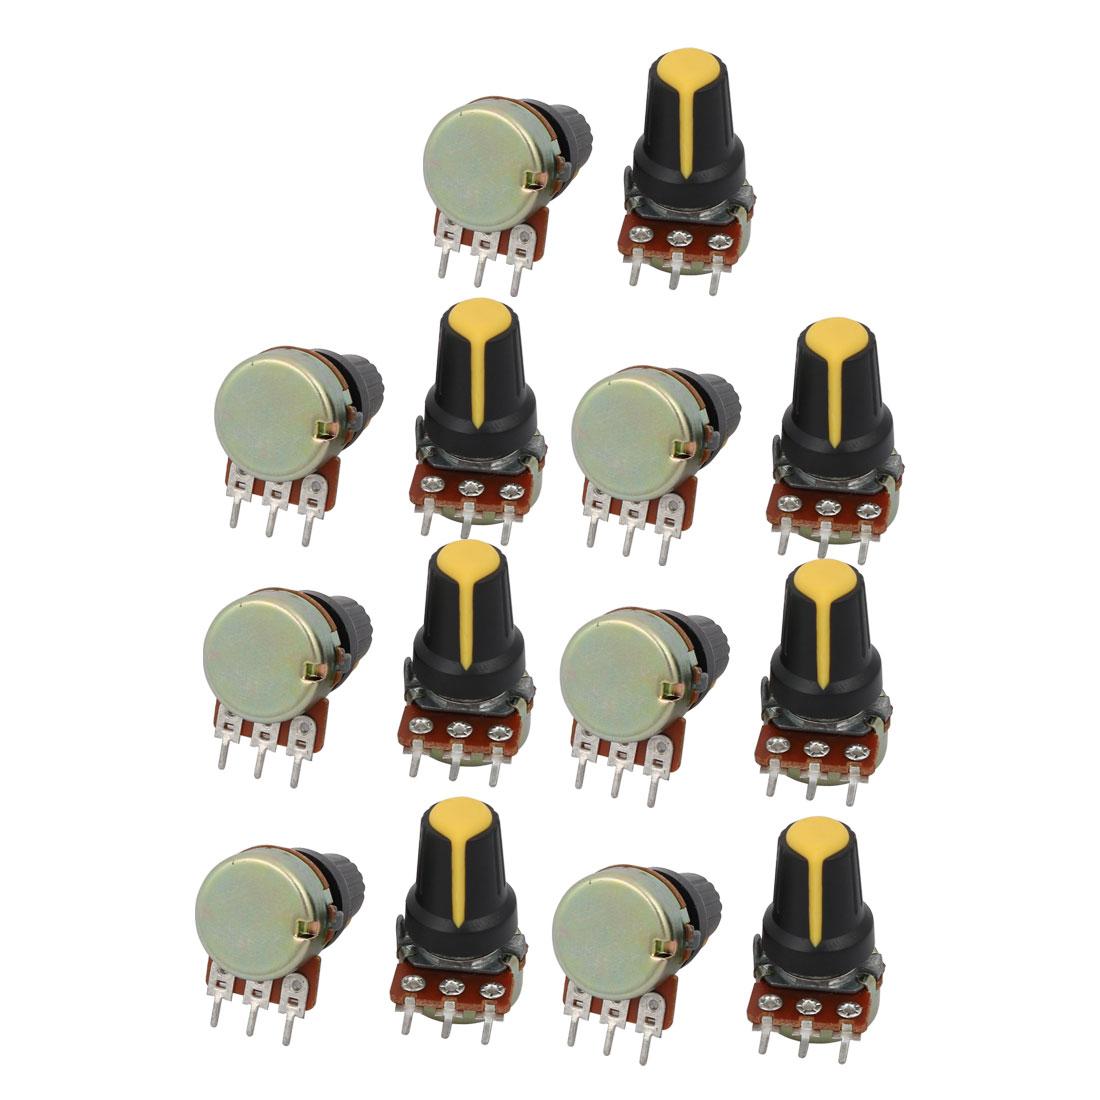 14pcs B10K 10K ohm 3 Terminal Single Linear Rotary Audio Taper Potentiometer